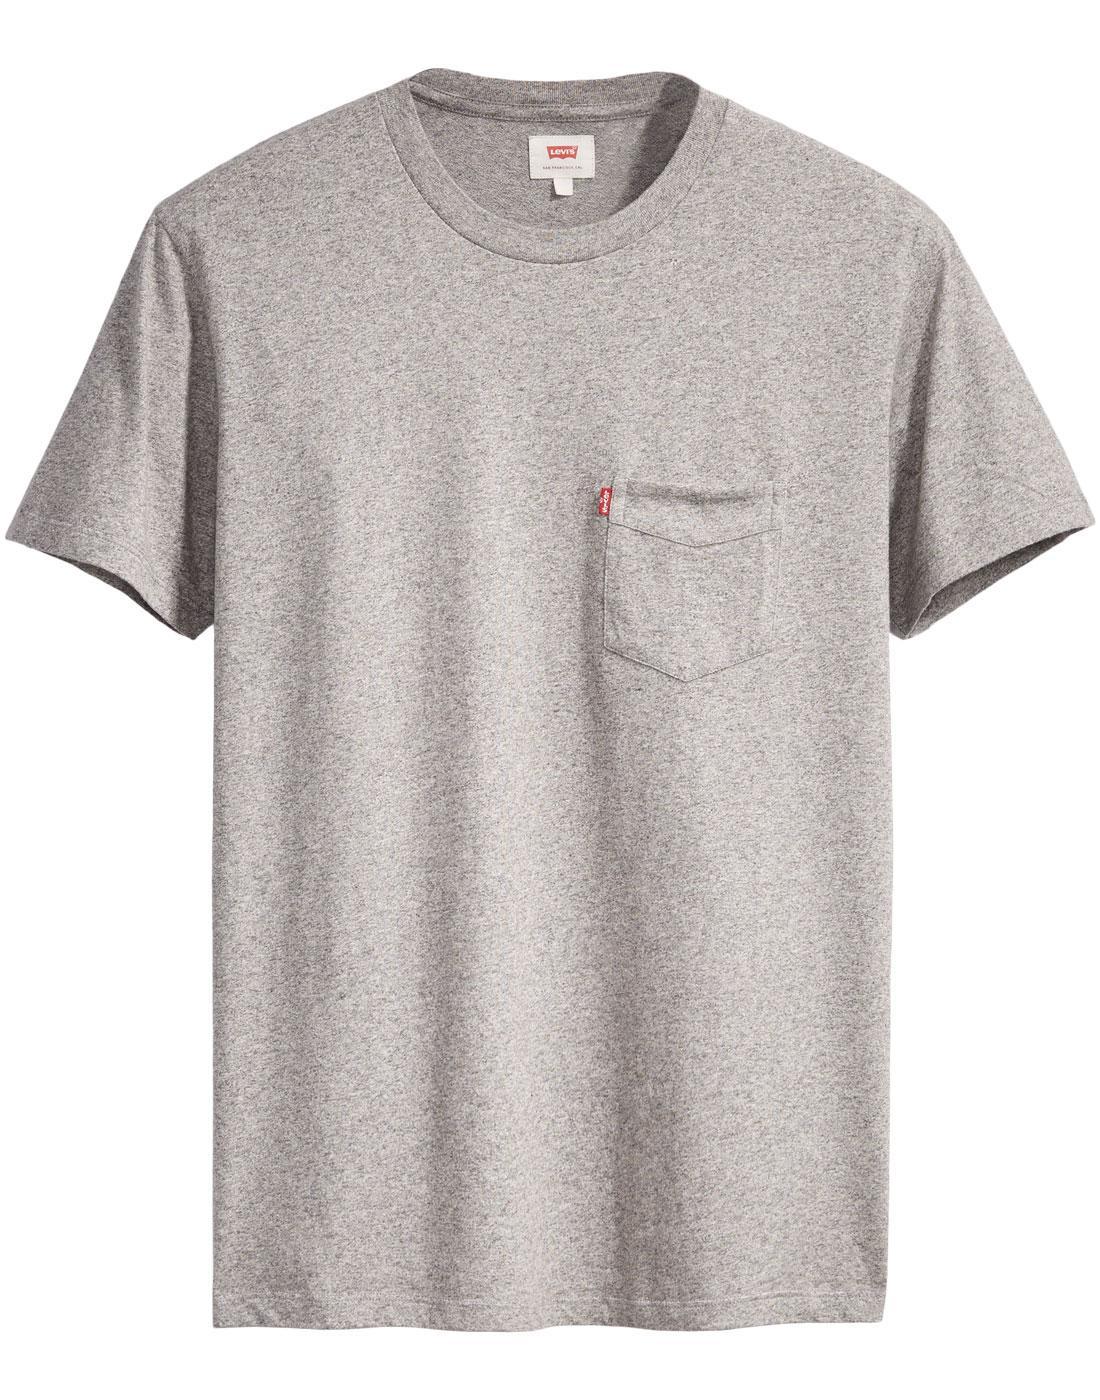 LEVI'S Retro Setin Sunset Pocket T-Shirt (Grey)